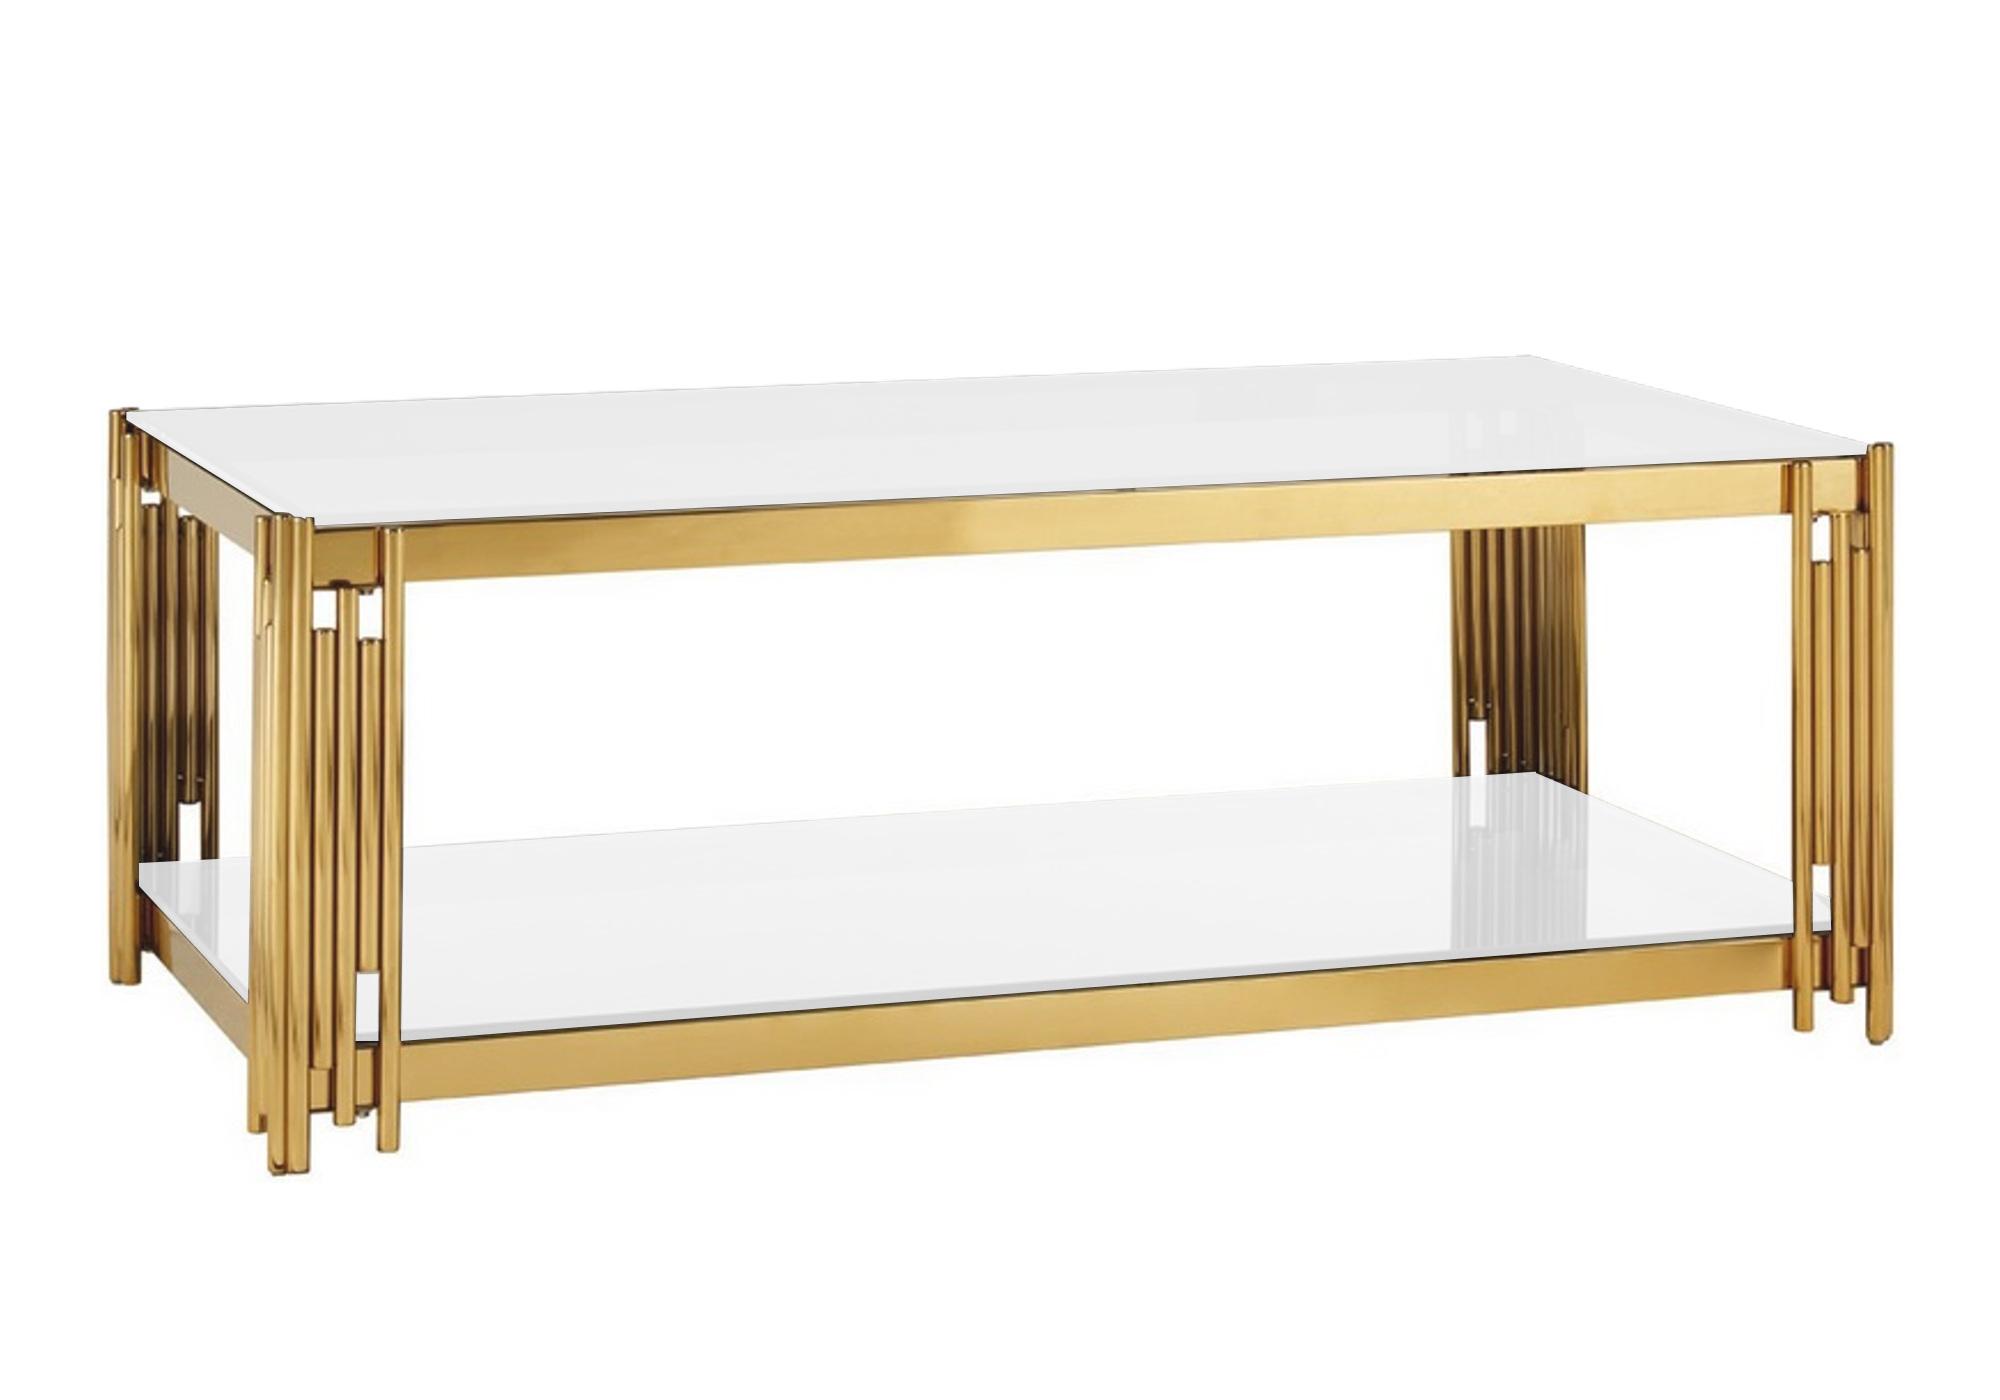 Table basse design doré blanc ÈVE